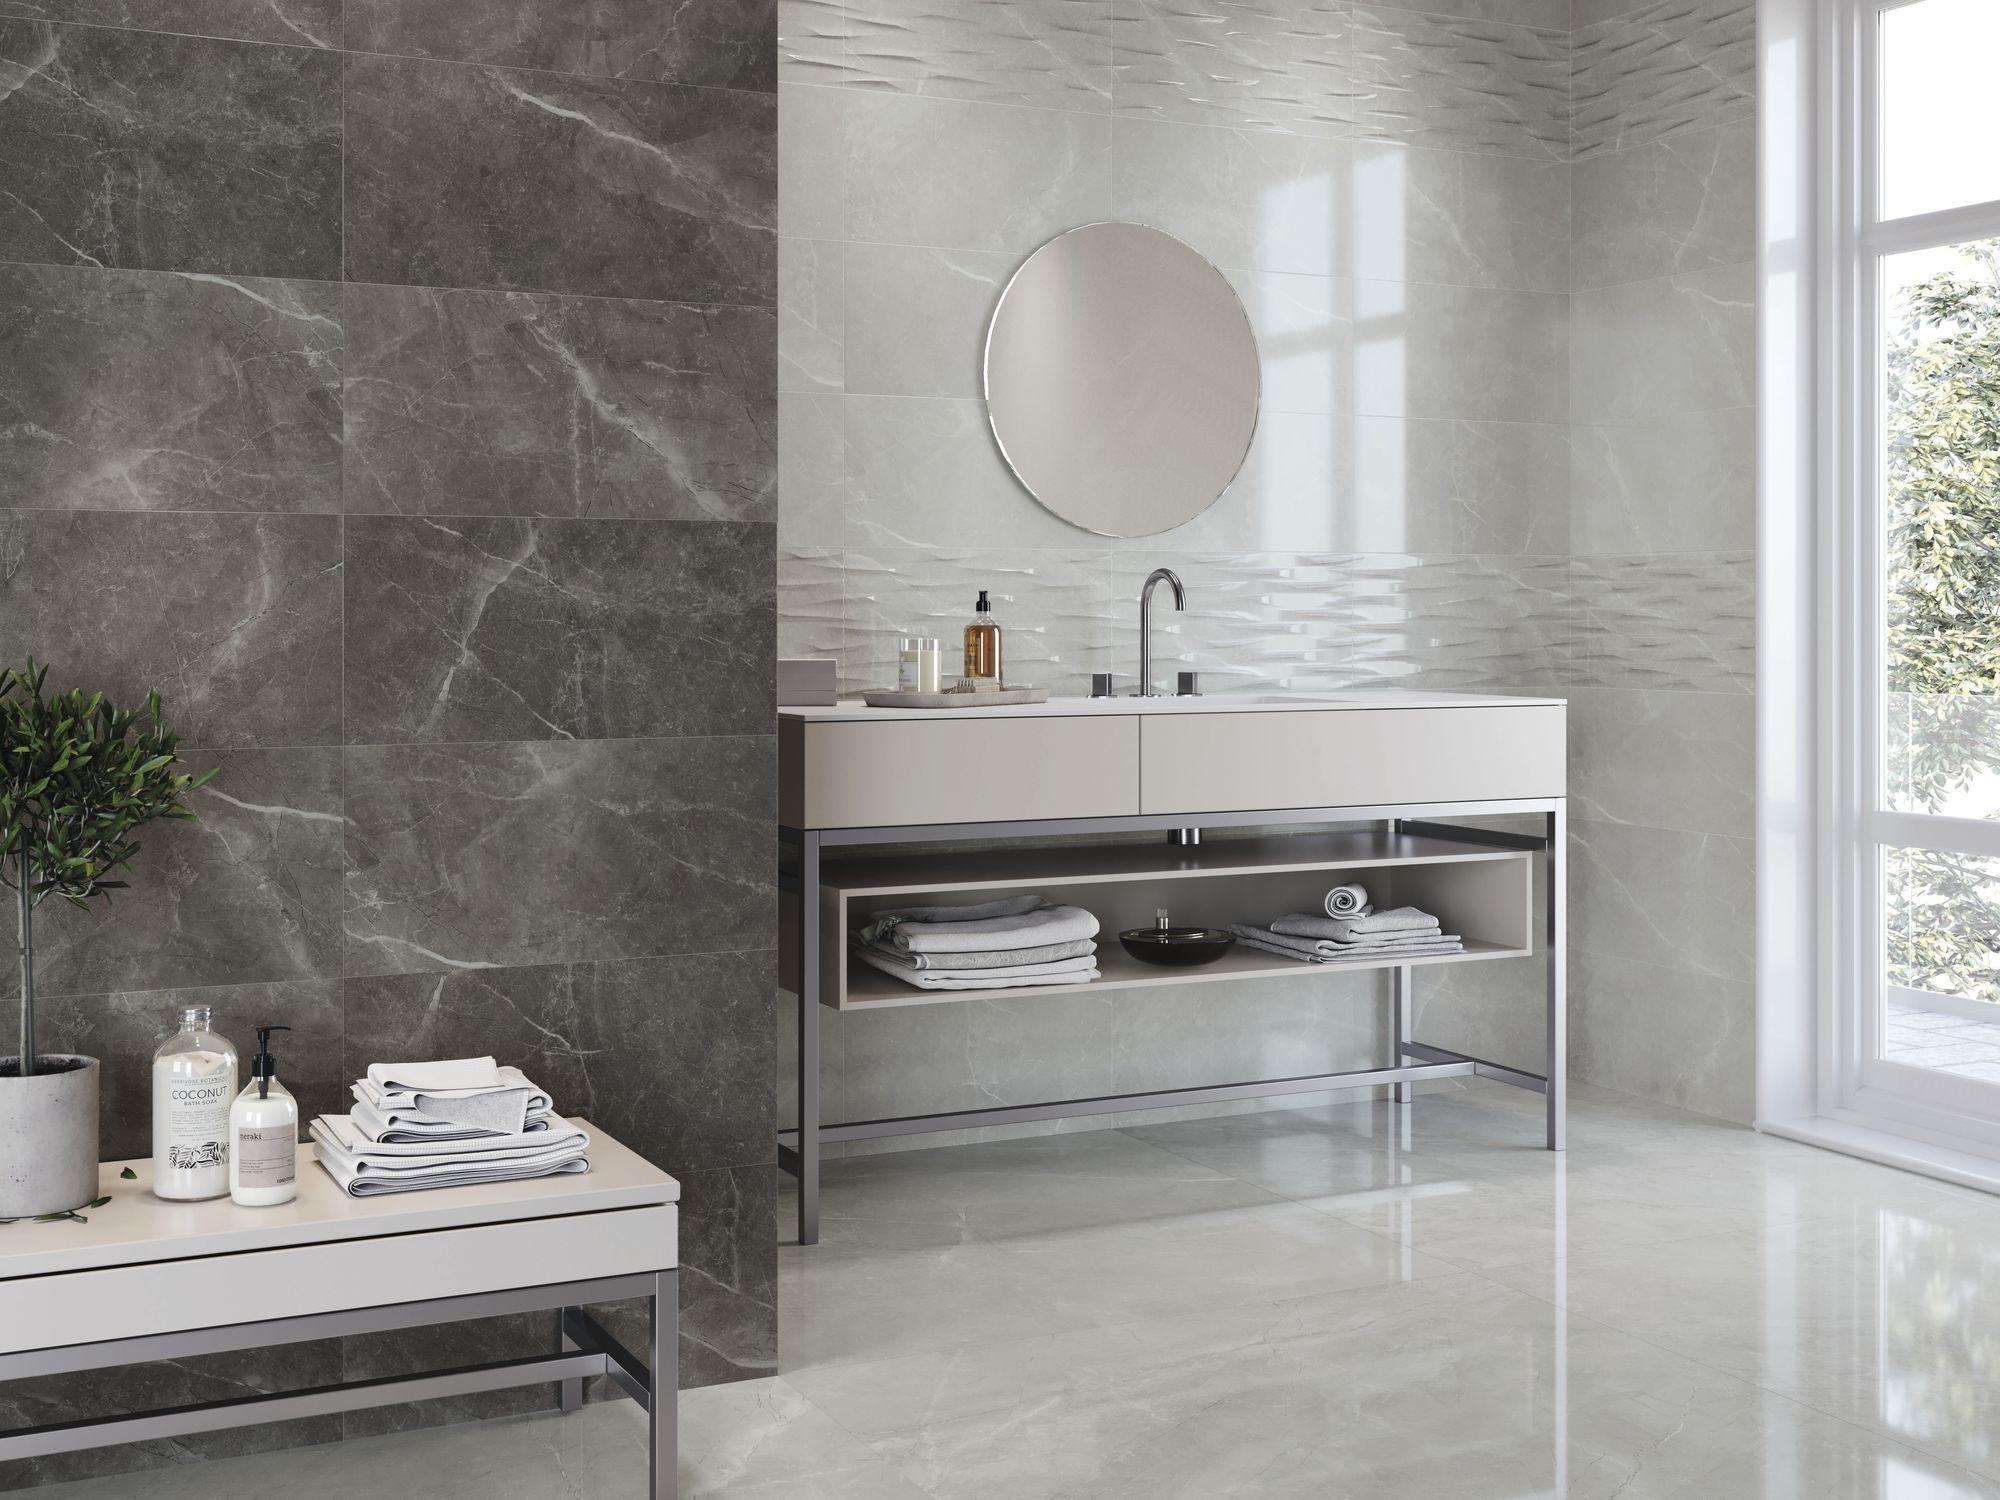 Bayona silver 30x60 cm. Bayona strass silver 30x60 cm. Bayona grey 30x60 cm. Pavimento Bayona silver 60x60 cm.